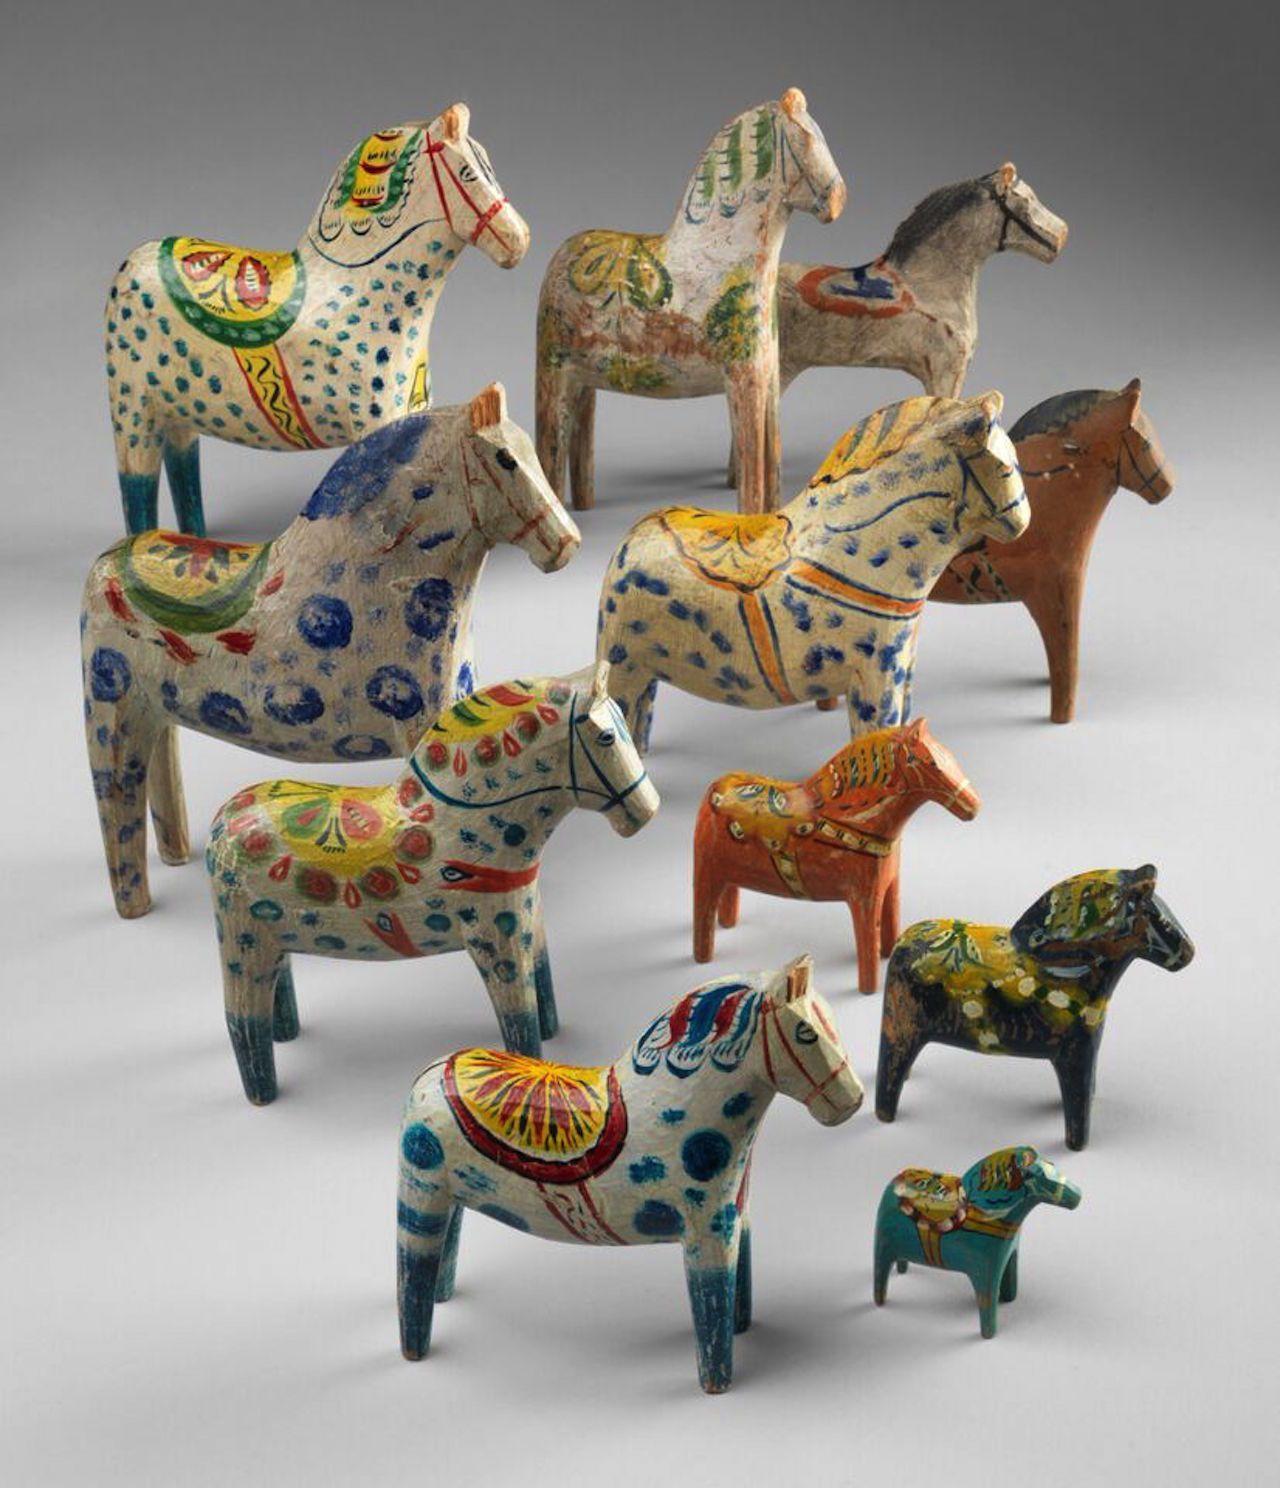 1960 toys images  A herd of Dala horses county of Dalarna  Wood  photo